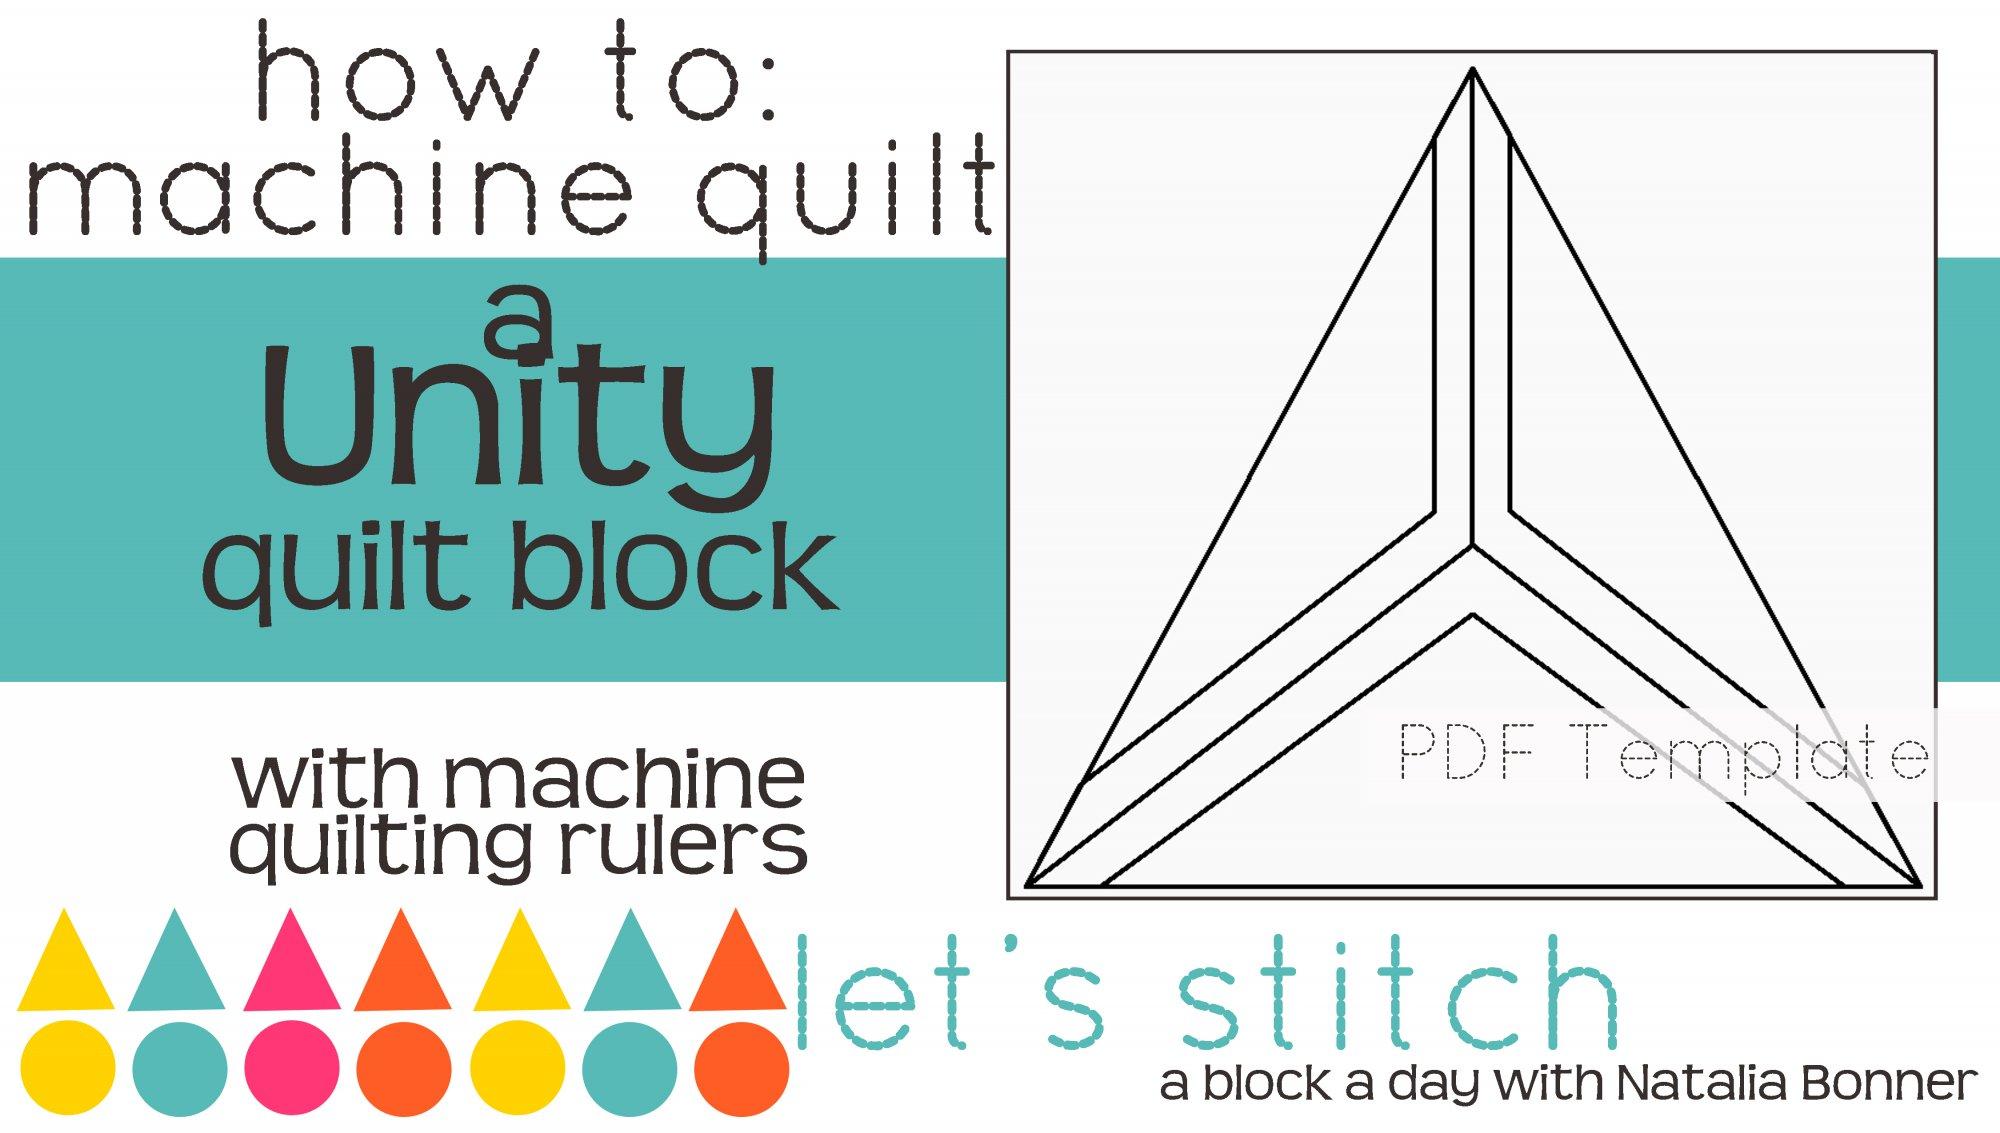 Let's Stitch - A Block a Day With Natalia Bonner - PDF - Unity